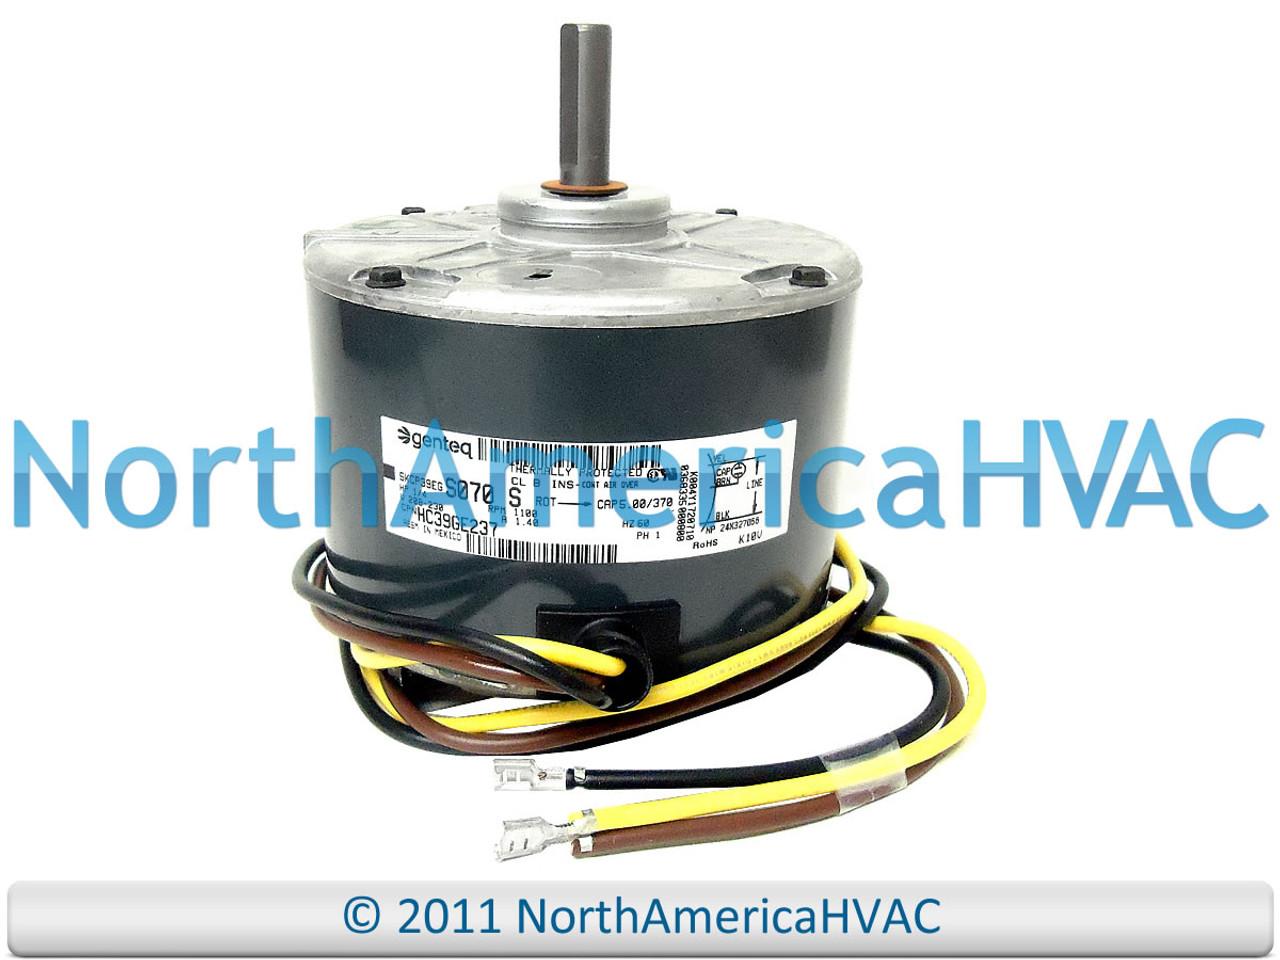 GE Genteq Condenser FAN MOTOR 1/4 HP 208-230v 5KCP39EGS070S - North America HVAC